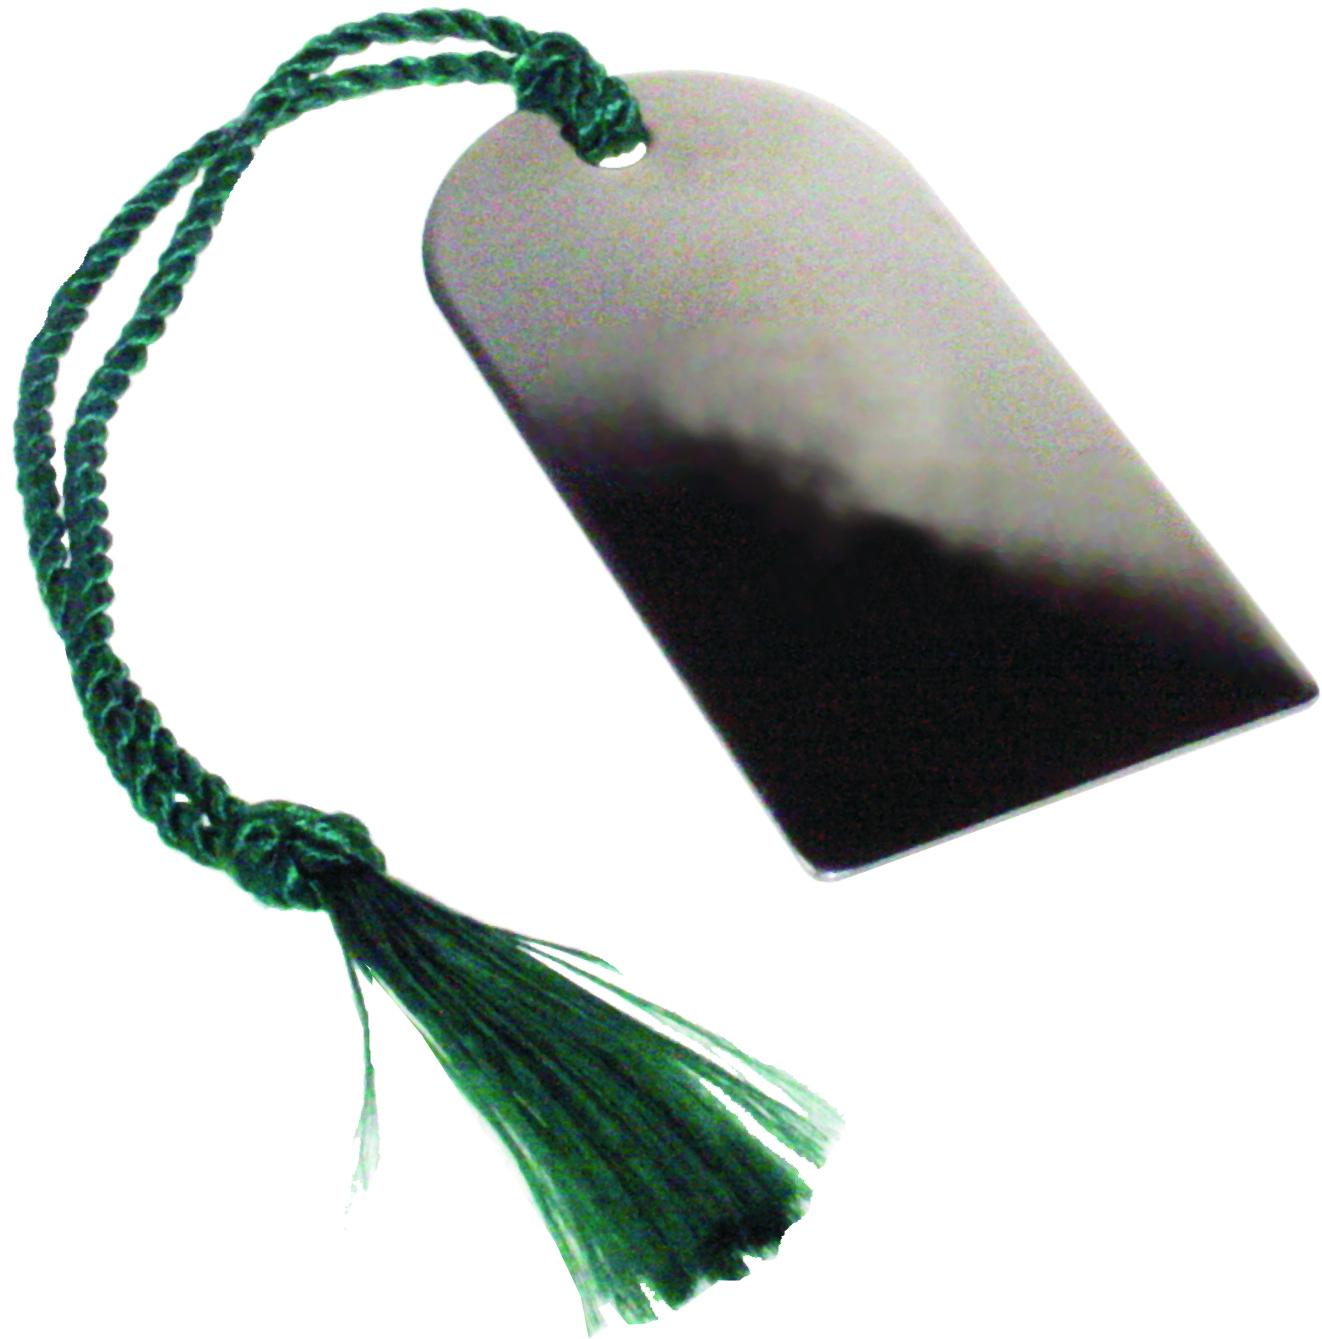 "Stainless Steel Bookmark 6.5cm (2.5"")"